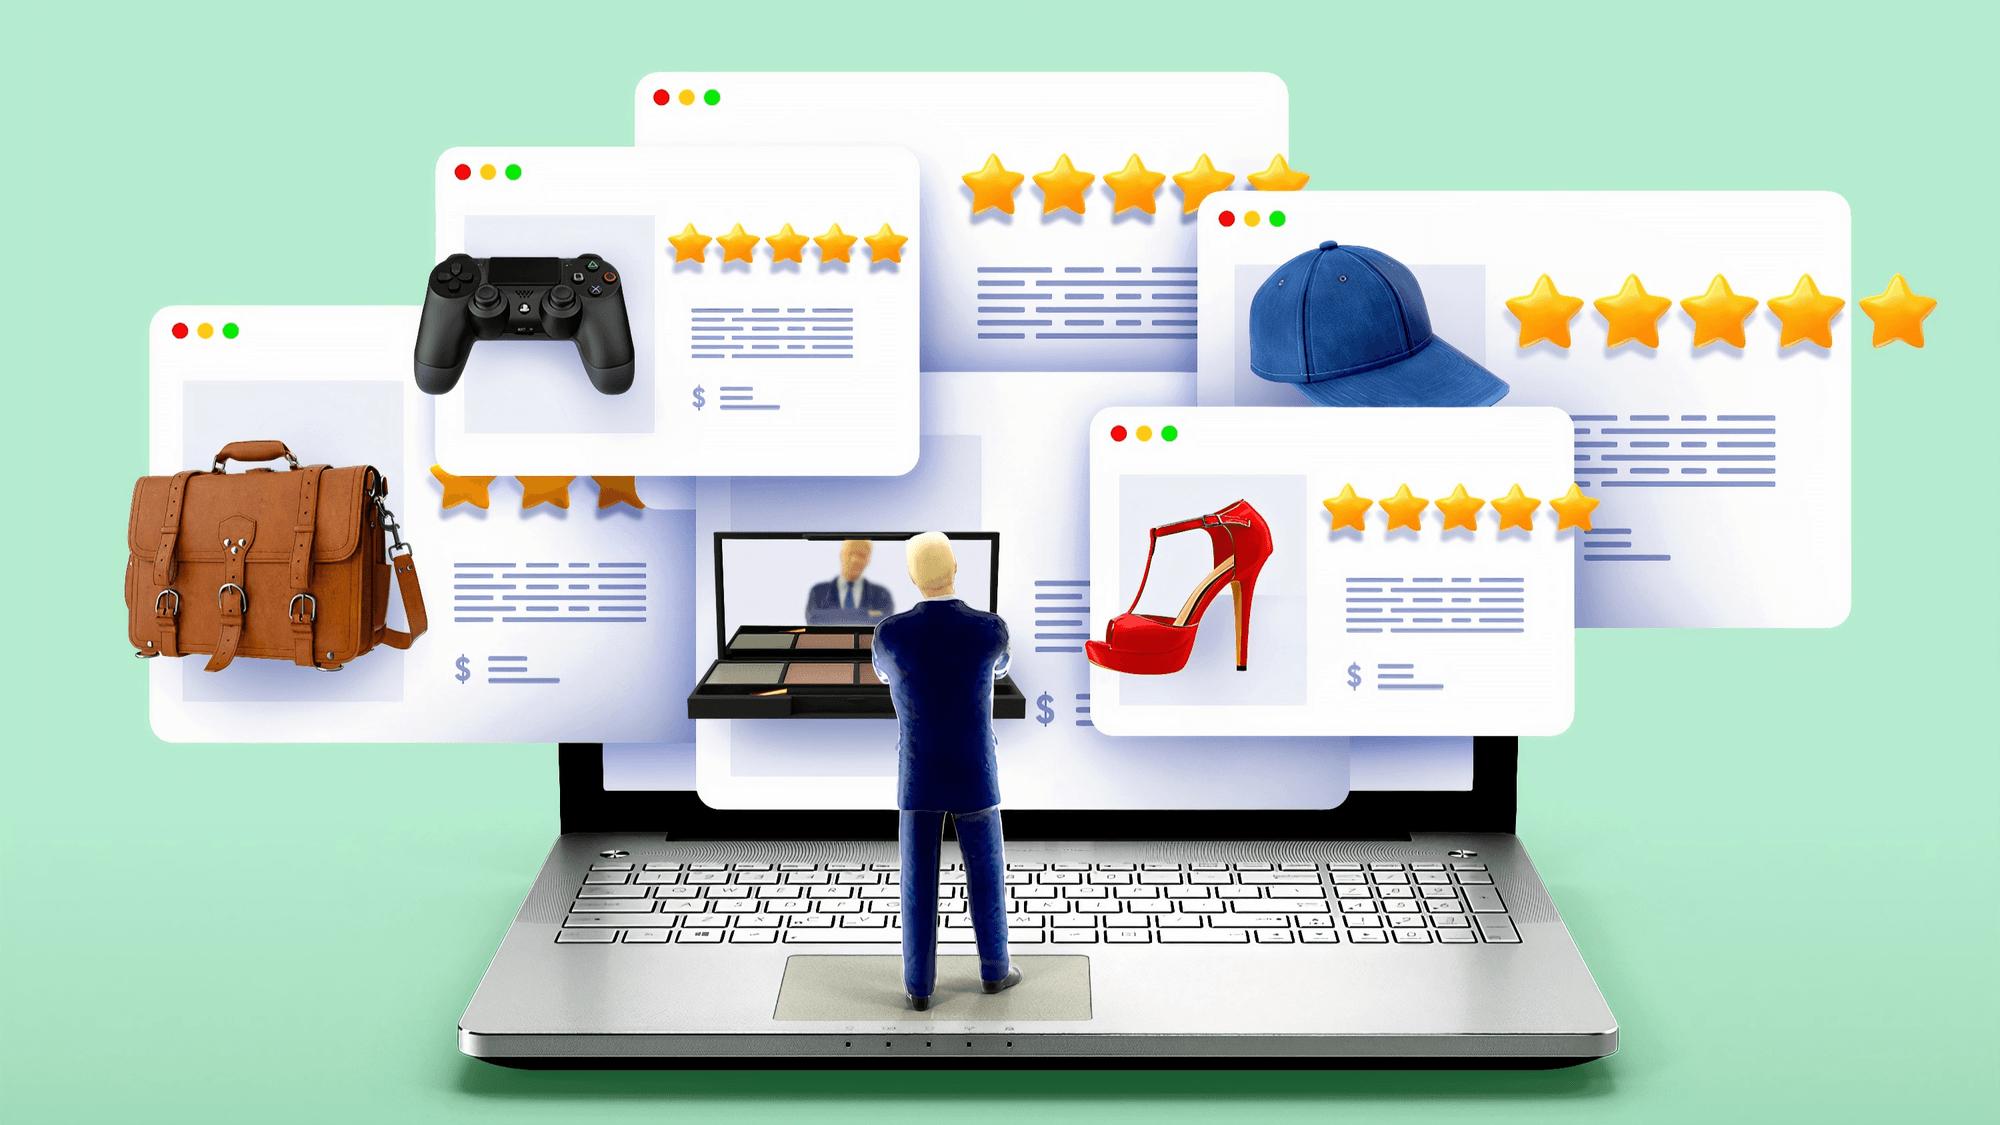 ecommerce online reviews marketplace marketing